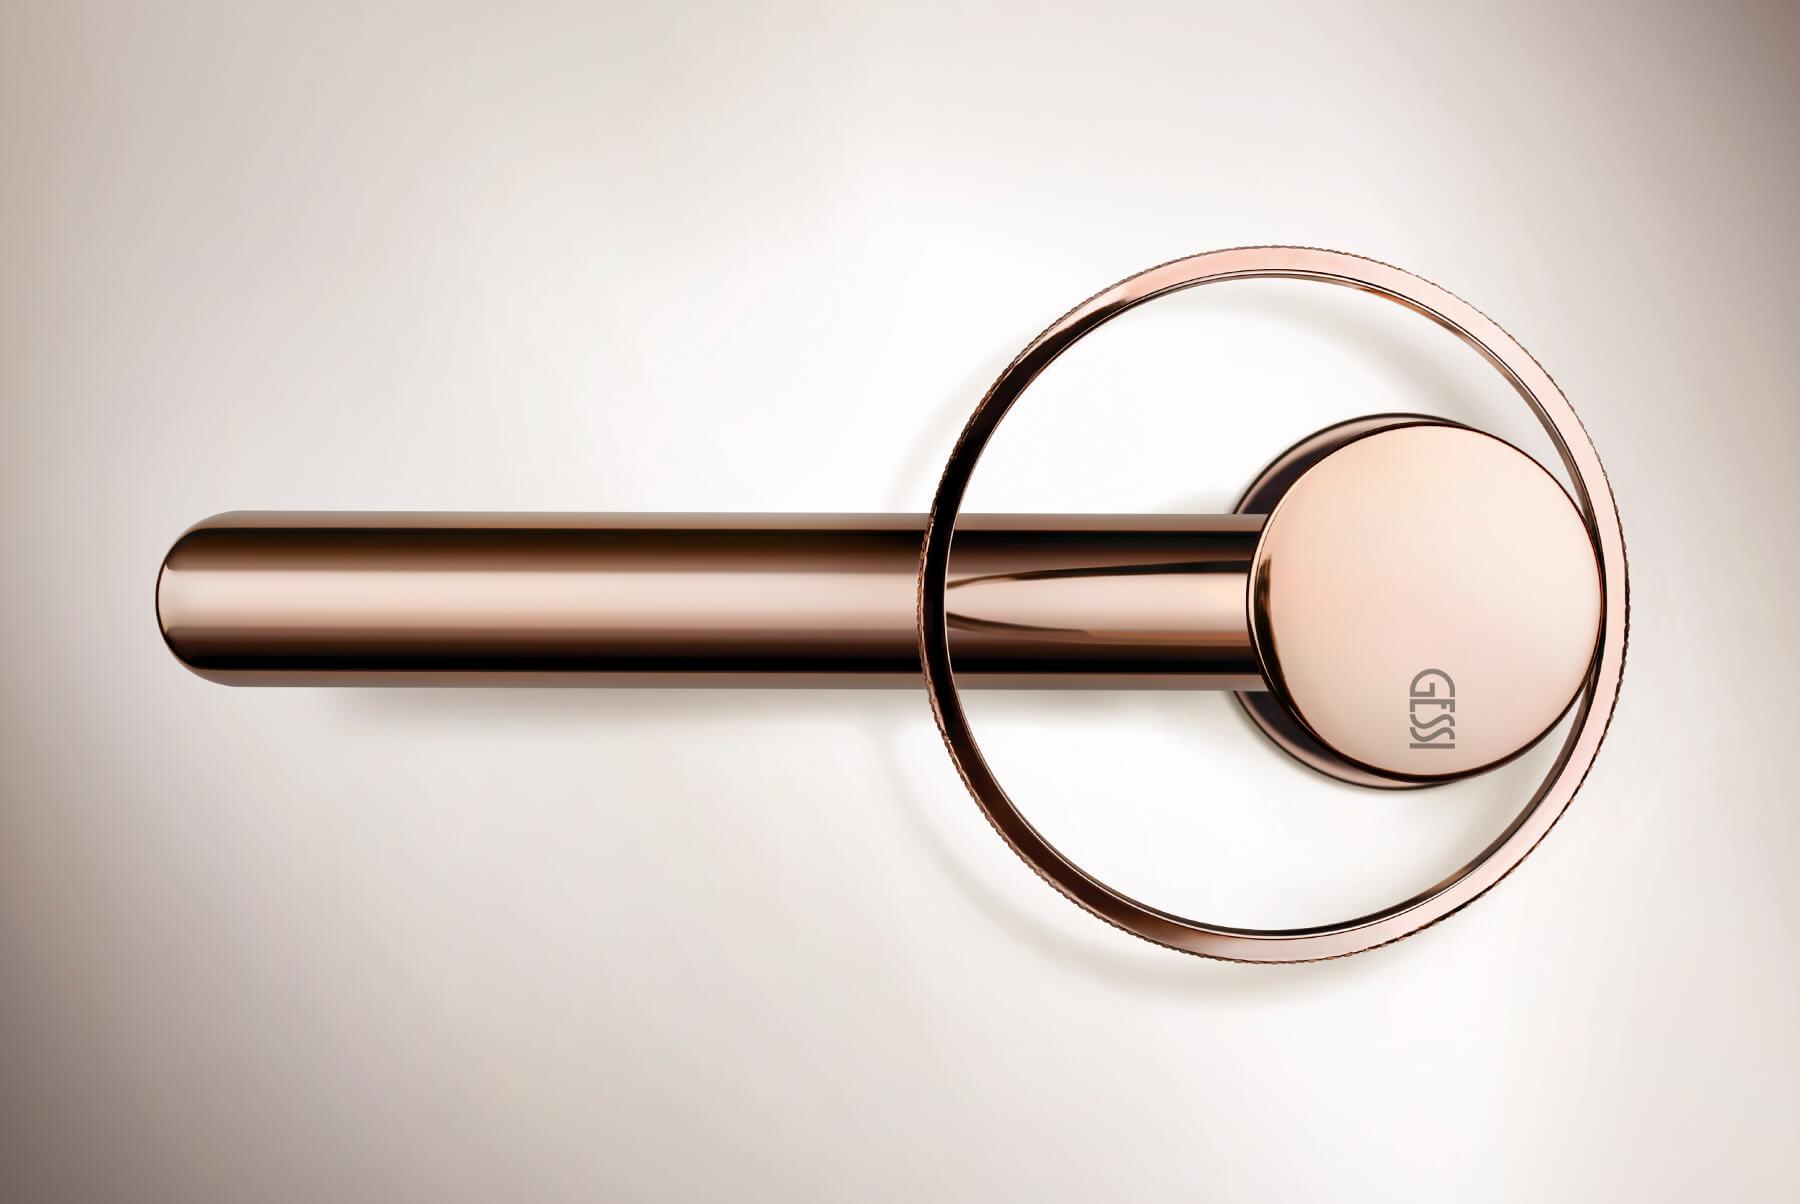 Brassware-GESSI-Anello-Inset-11-1800x1204